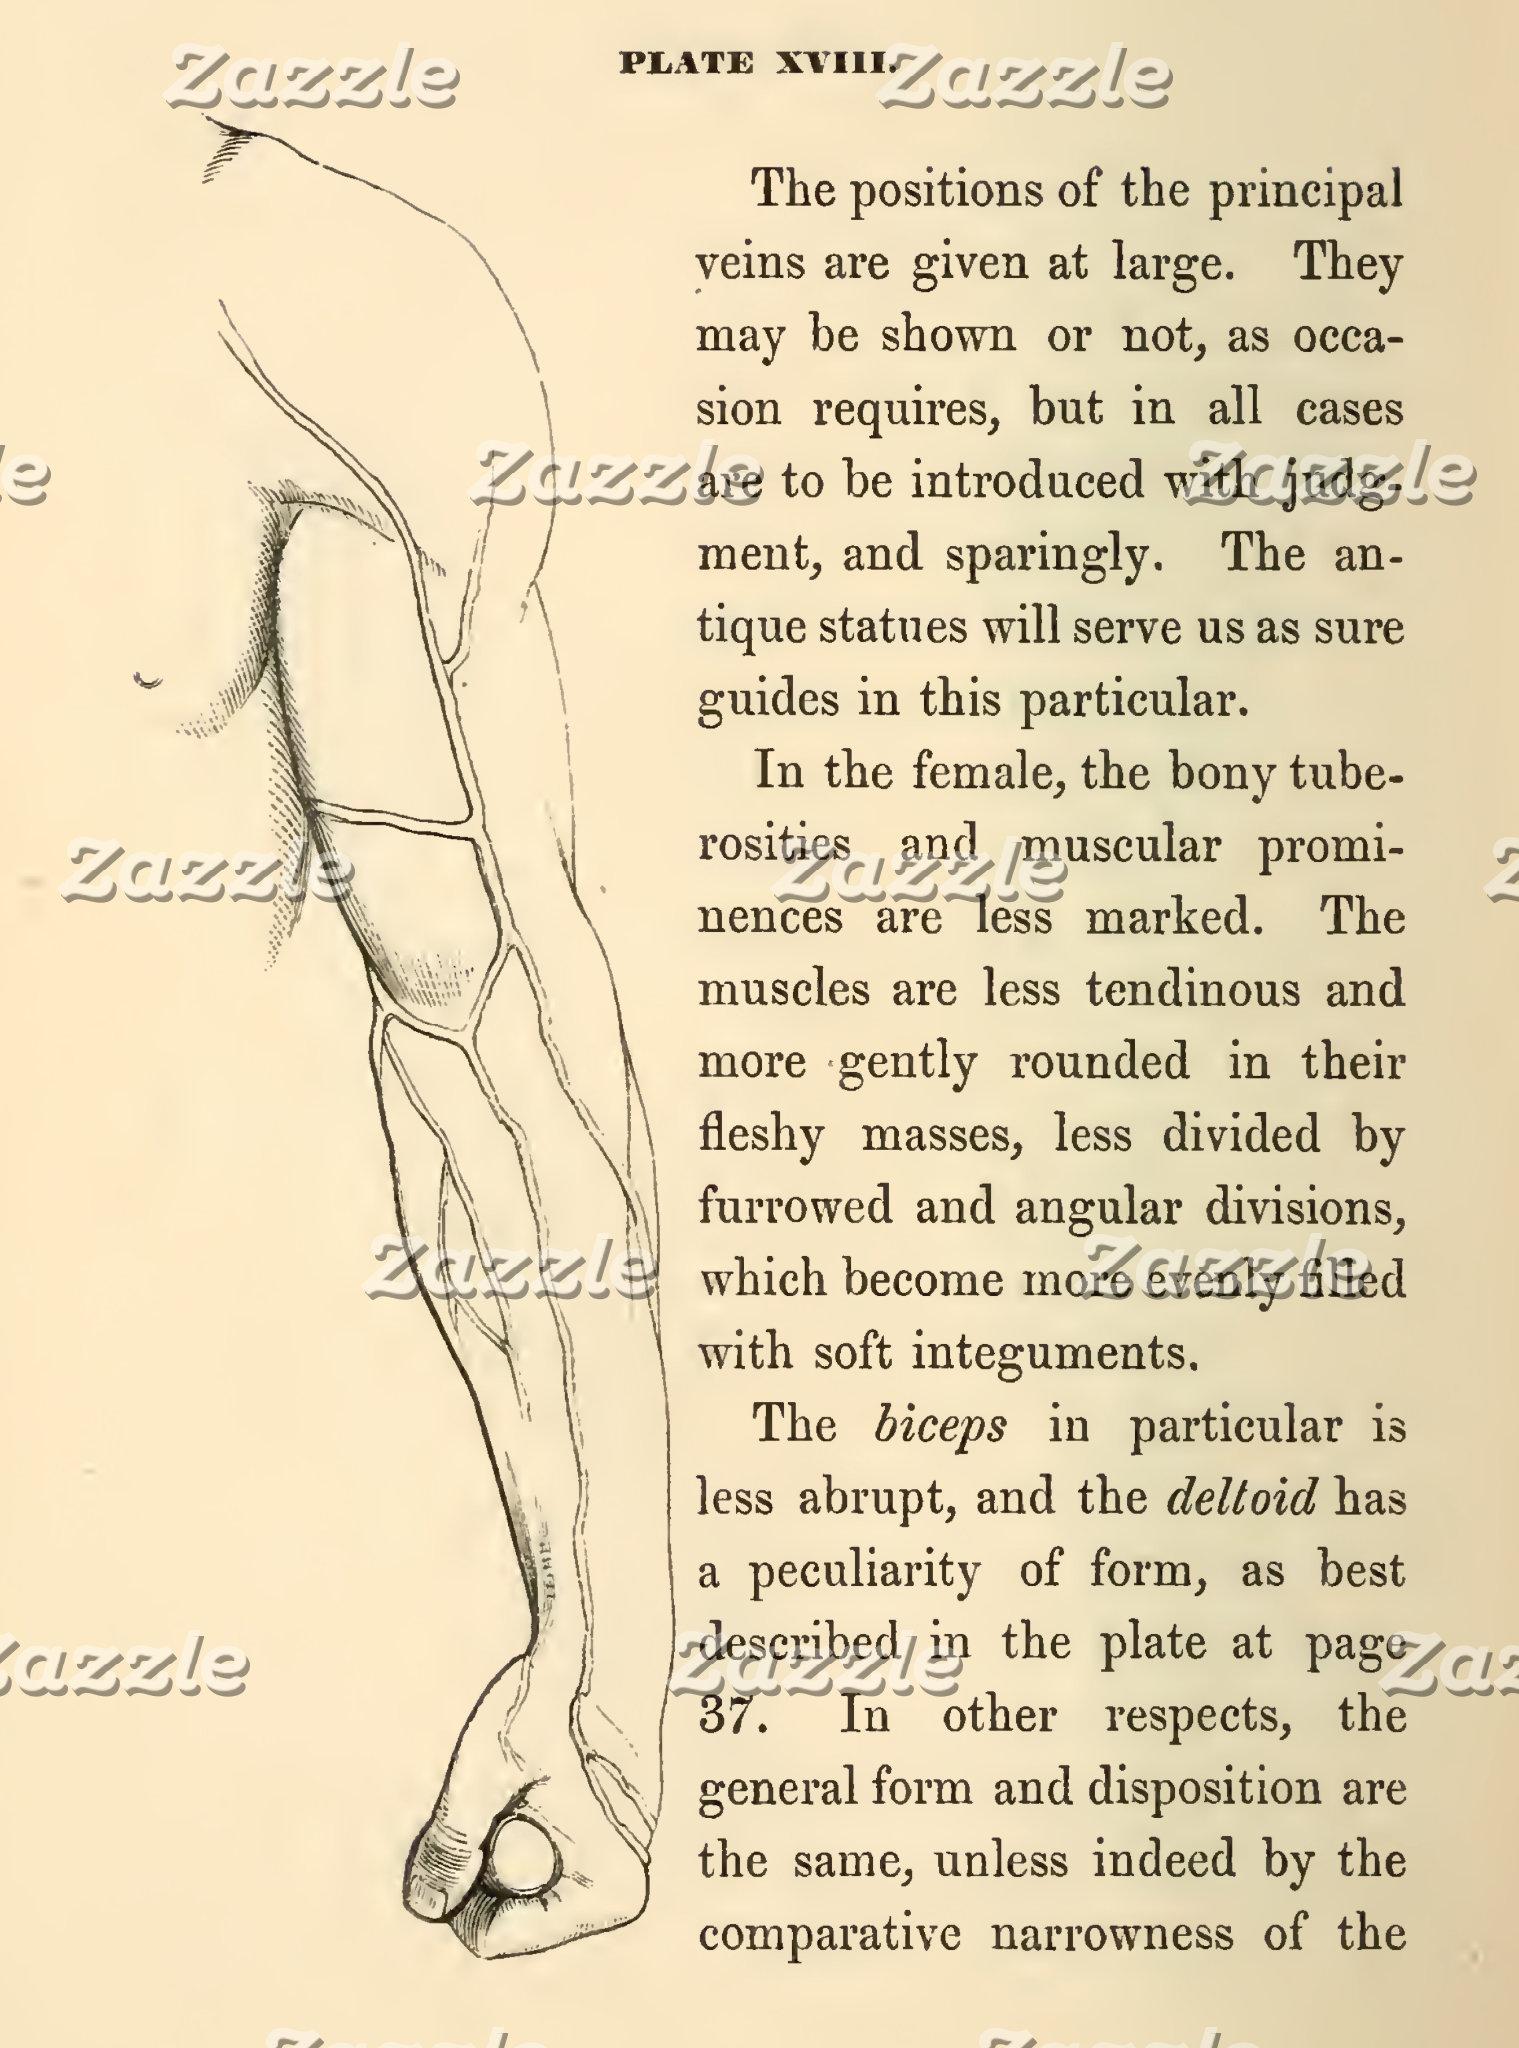 Vintage Anatomy   Veins of the Arm